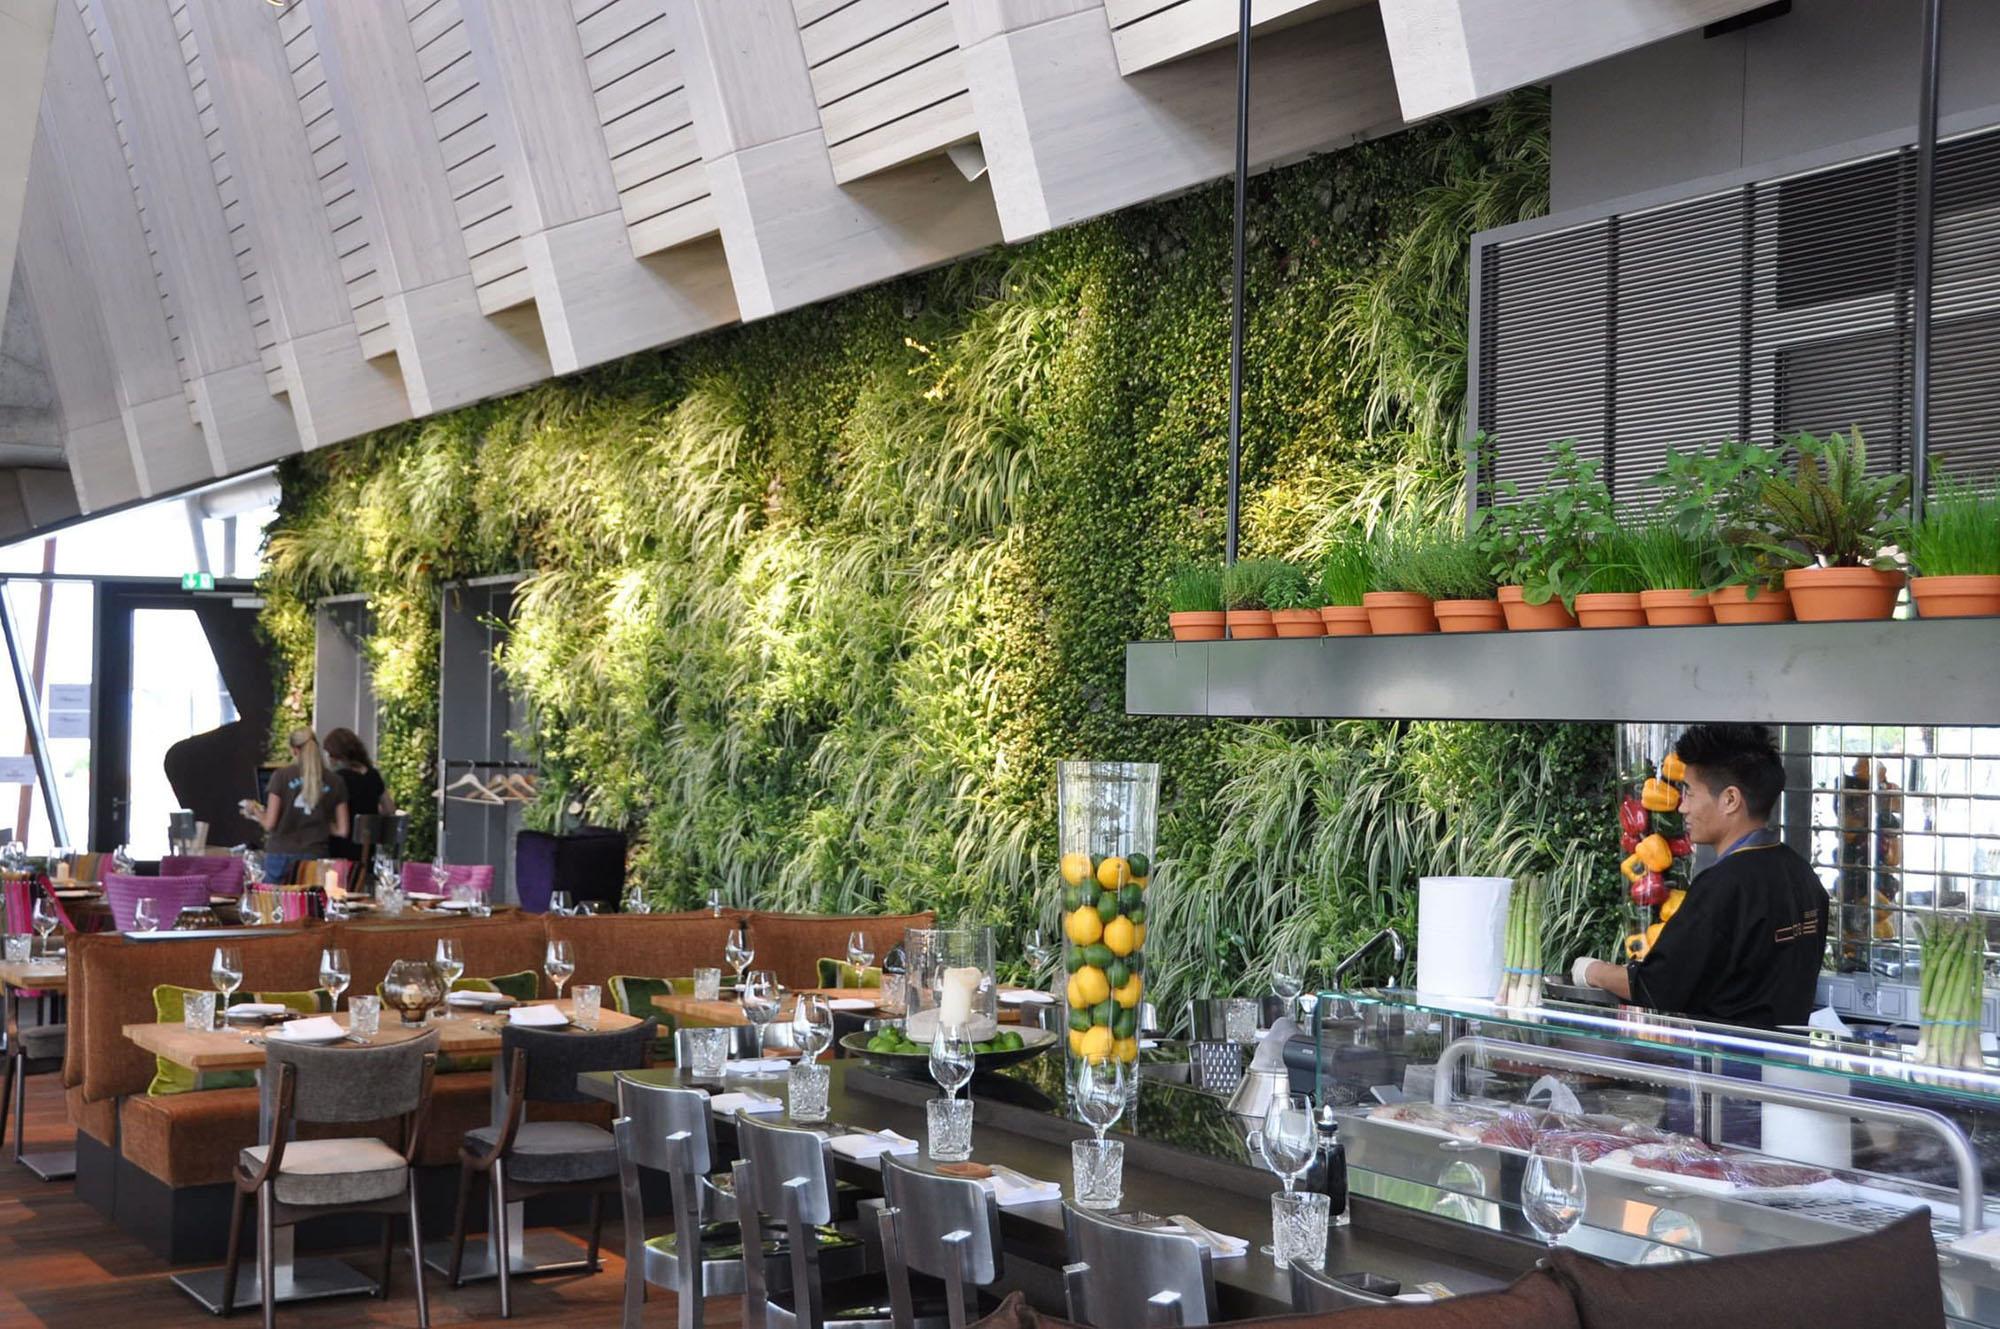 Plush living green Eco wall inside a restaurant.